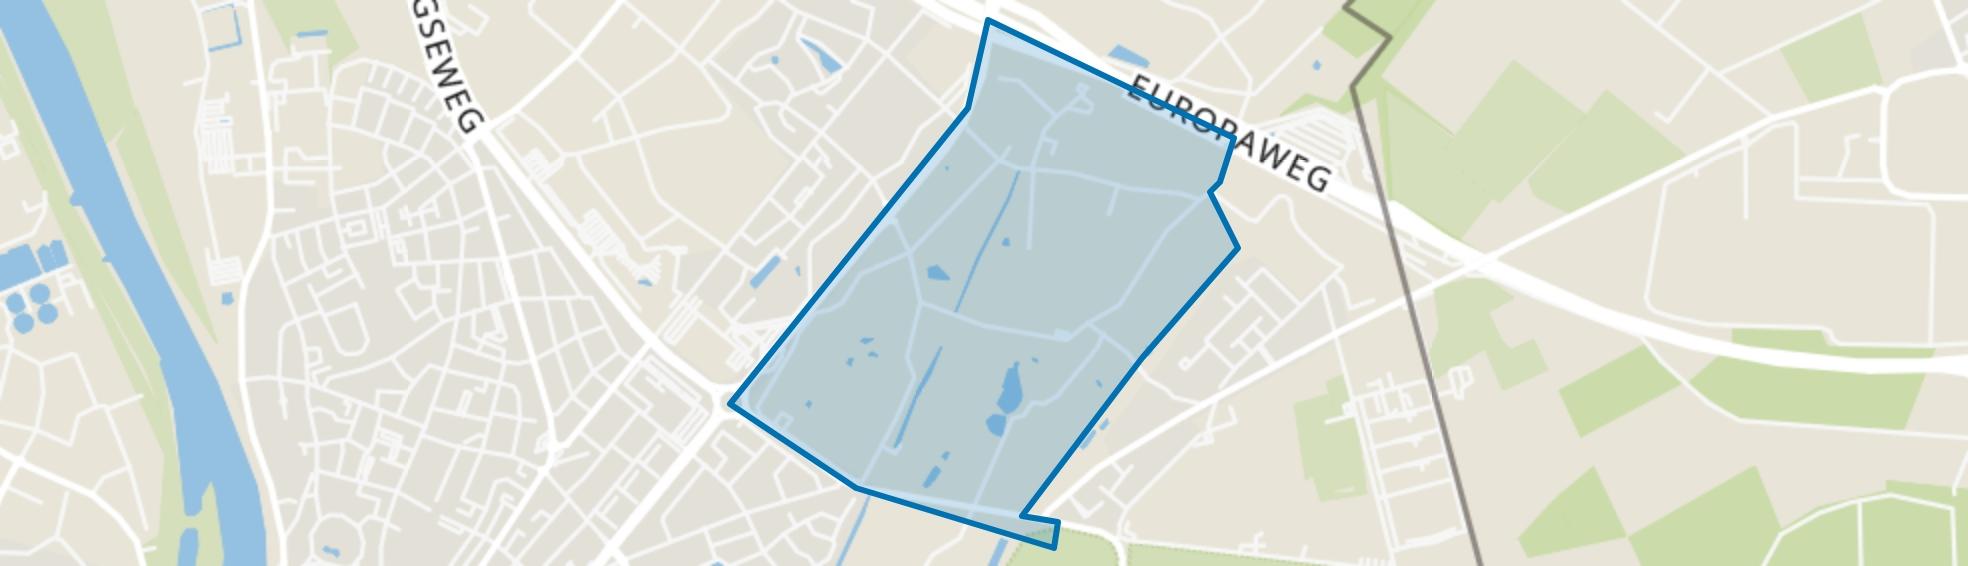 Arenborg, Venlo map